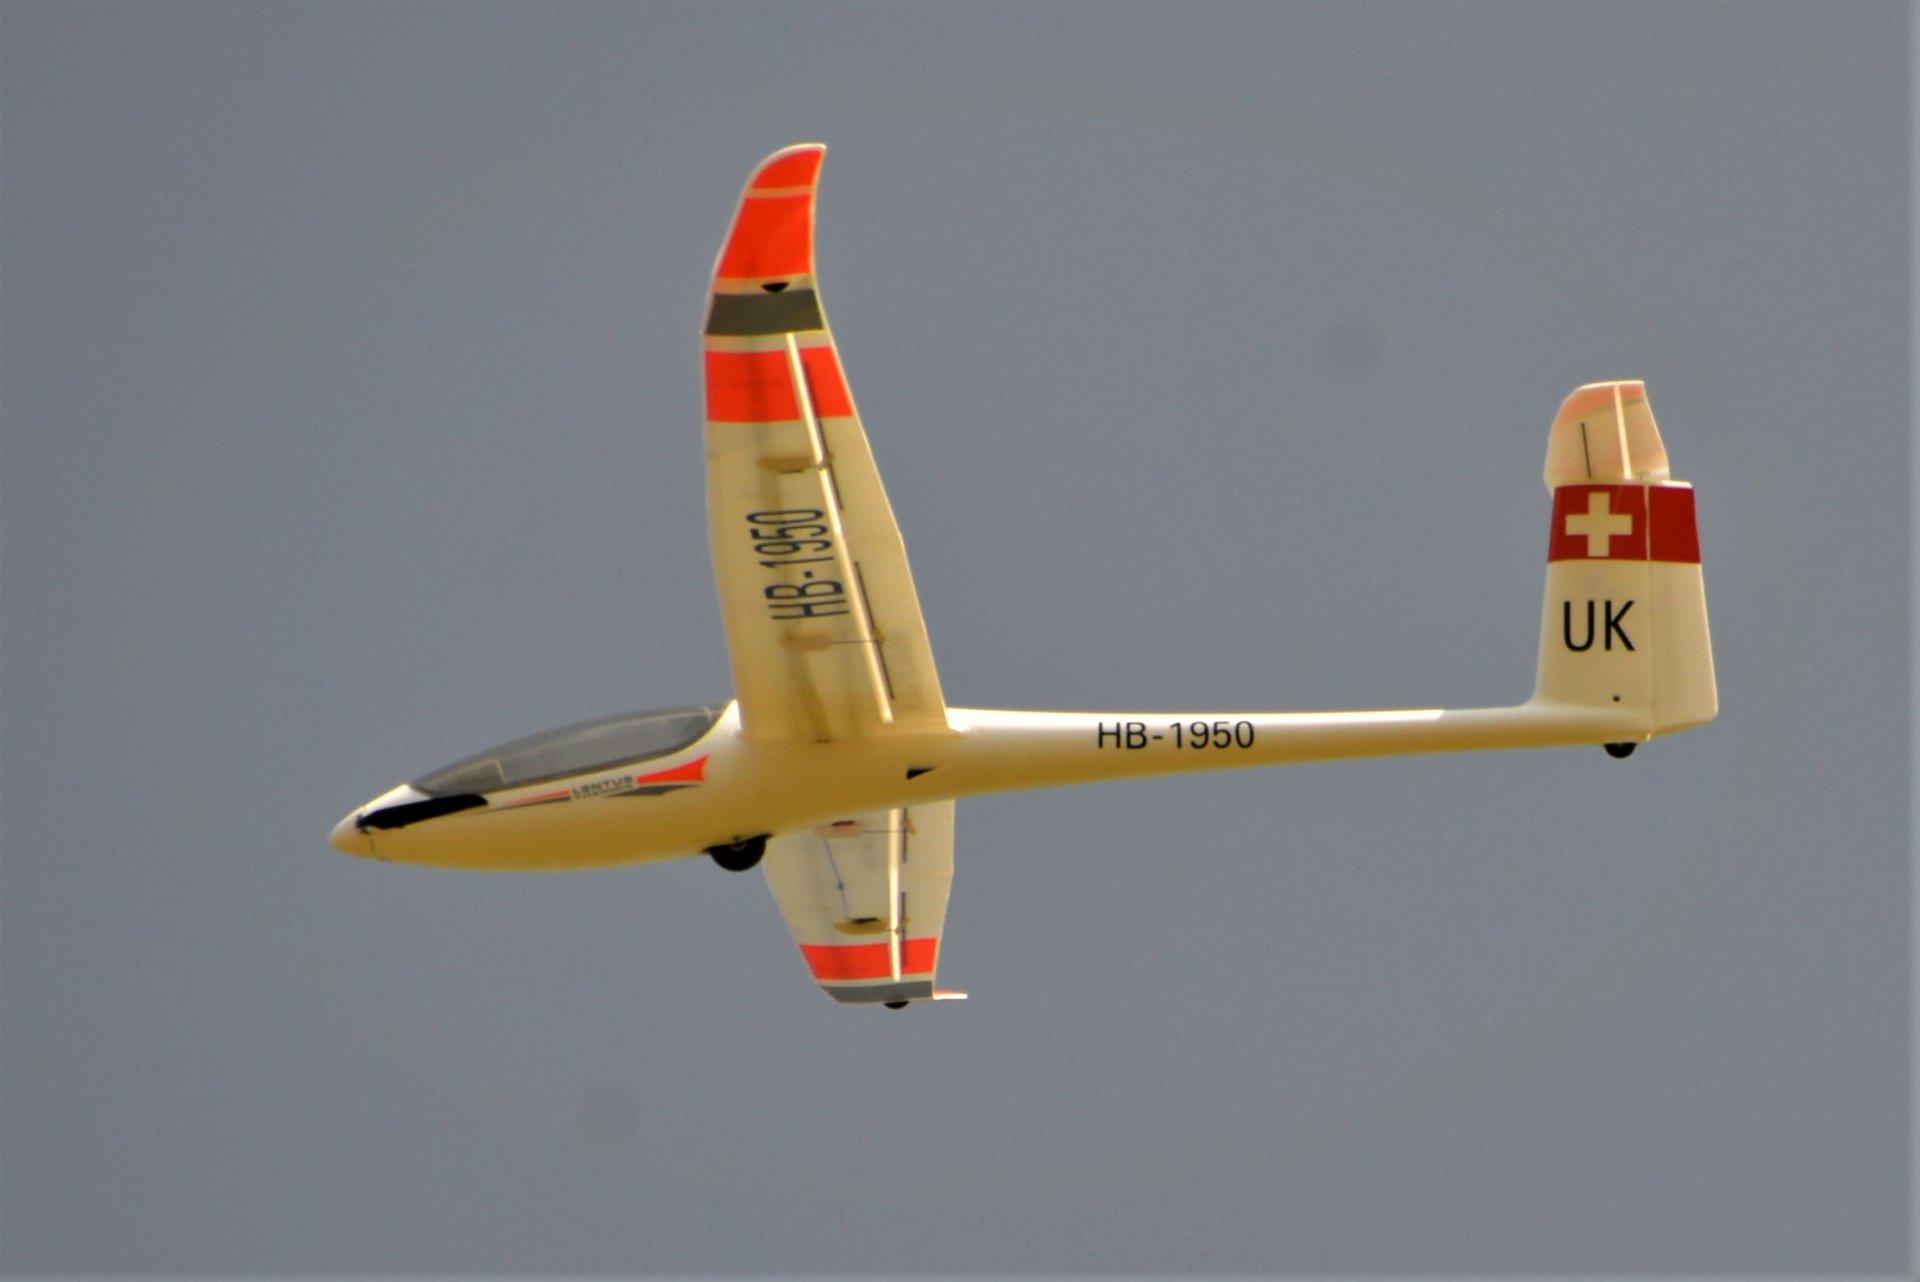 DSC_7373 (2).JPG